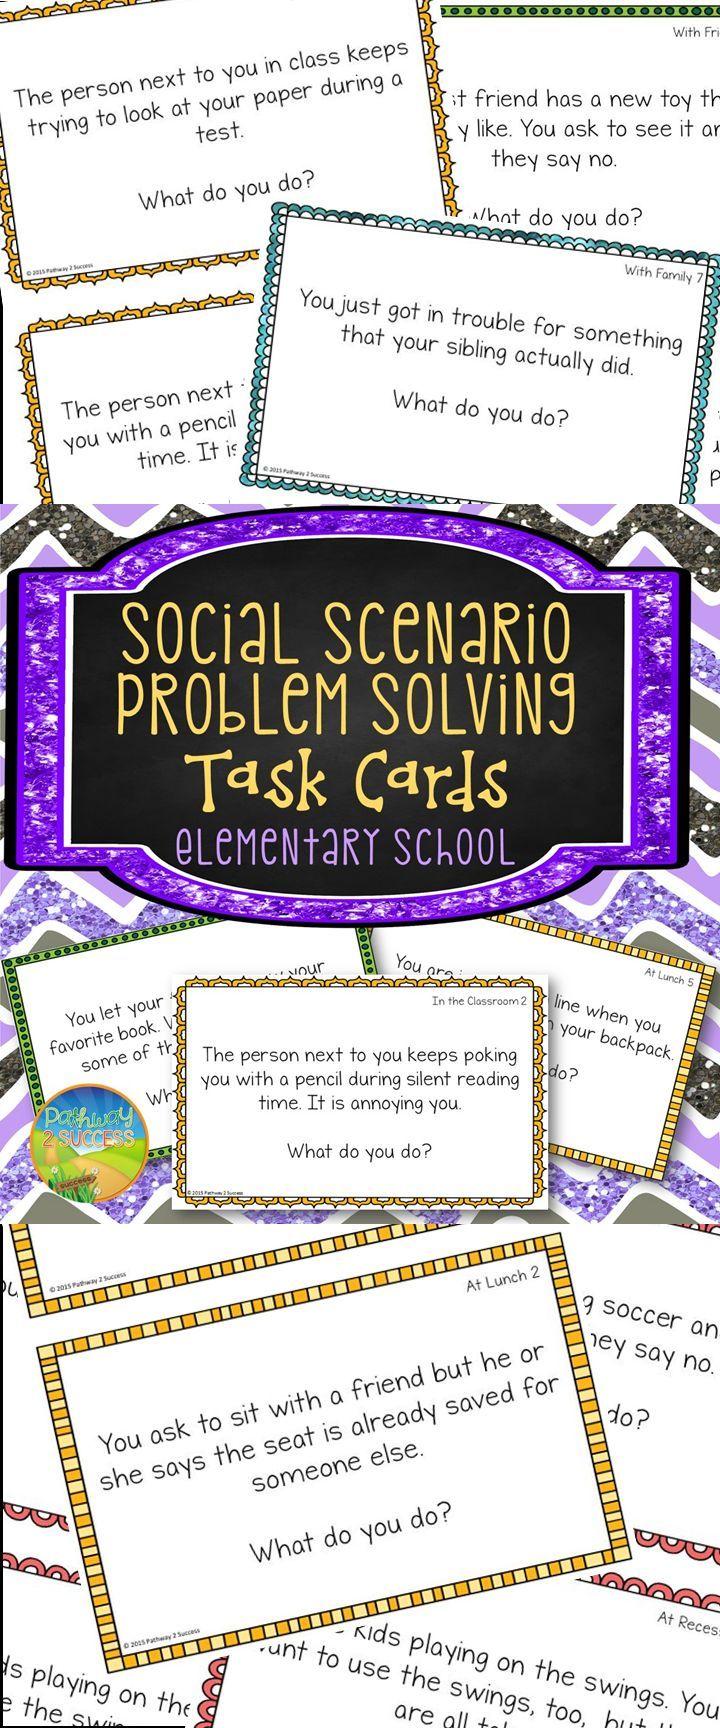 Worksheets Social Problem Solving Worksheets social problem solving task cards elementary schools school and cards